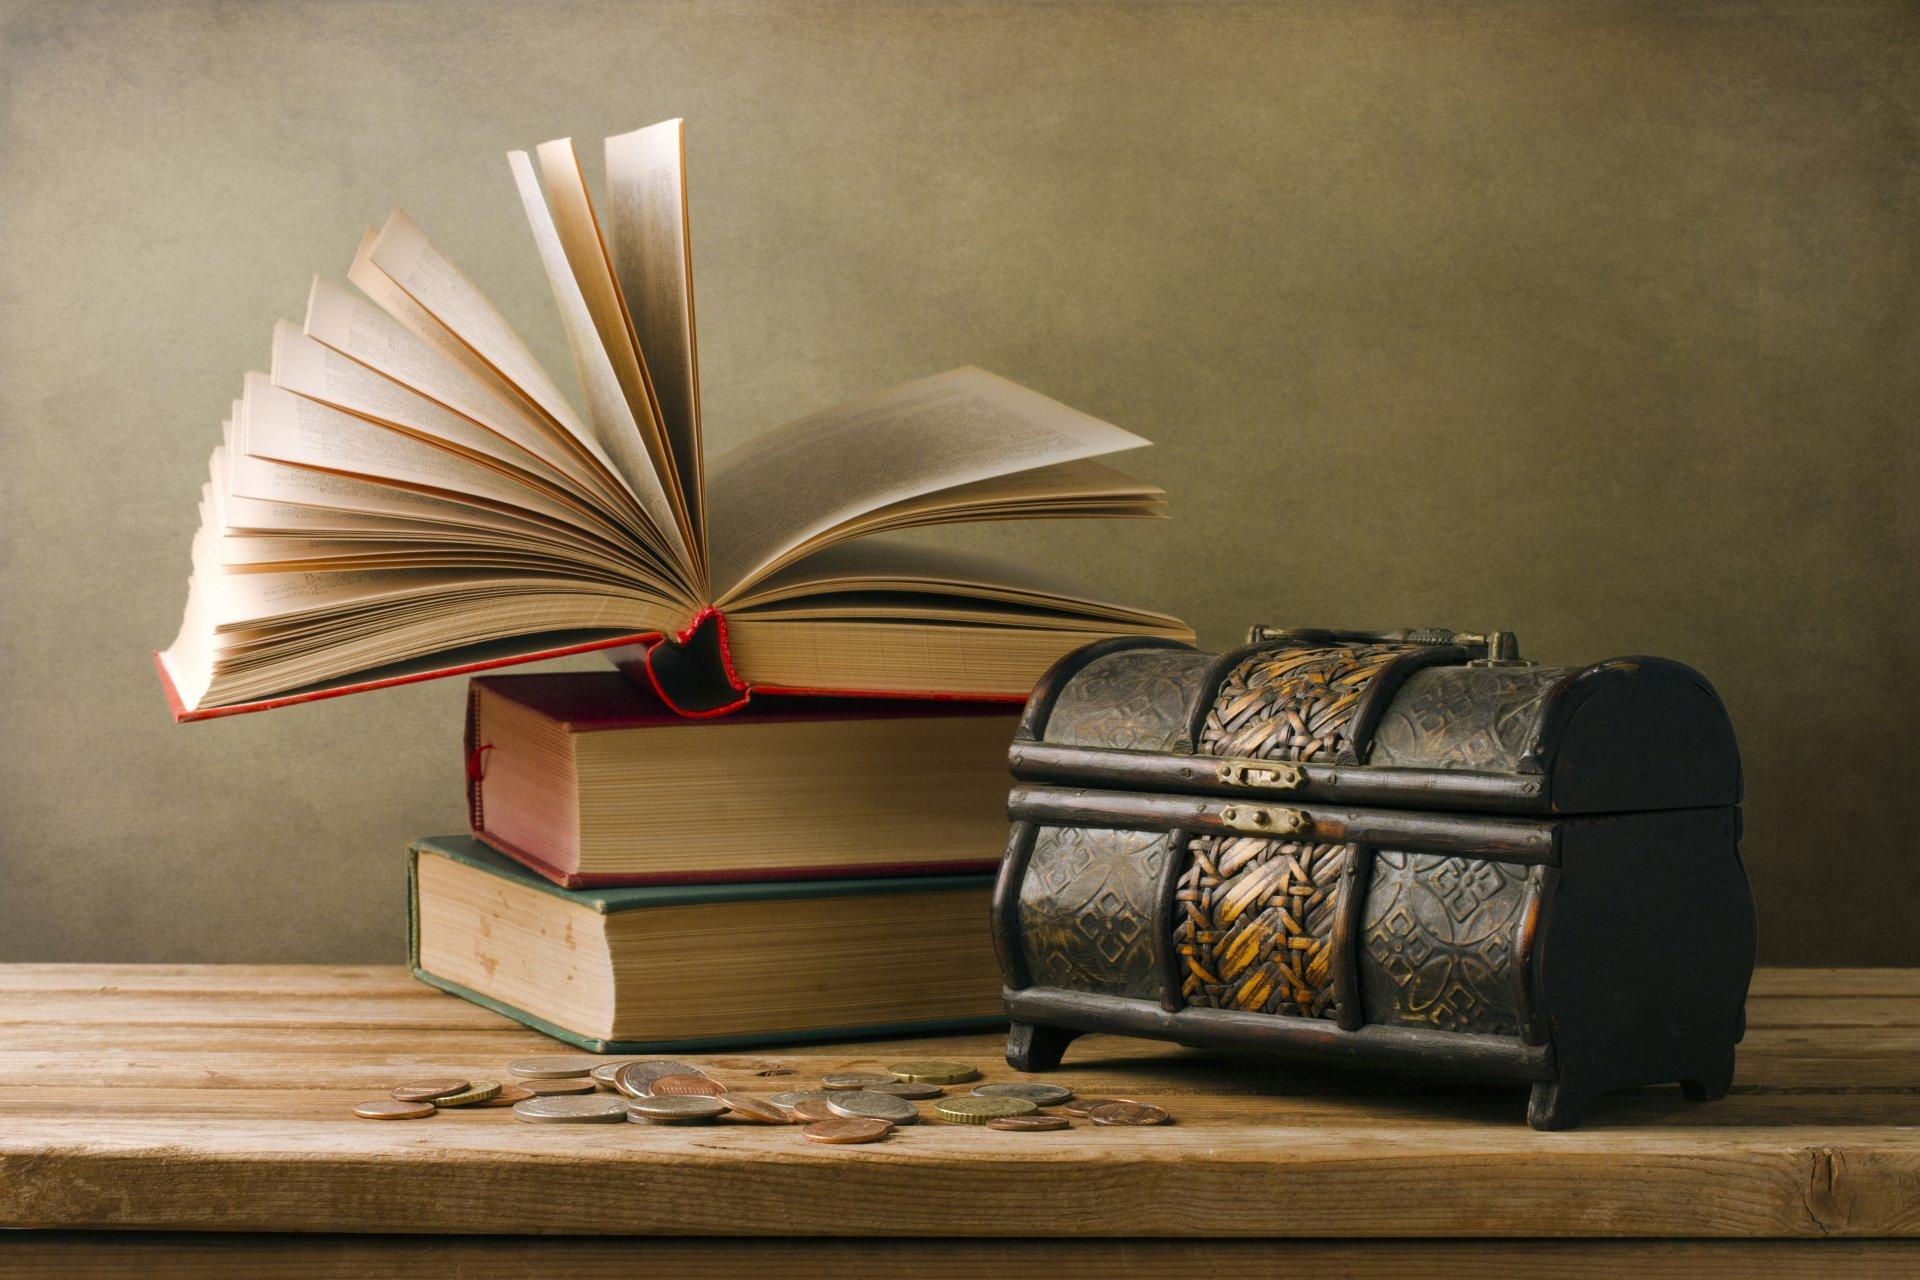 книги на фоне истории муж был одним